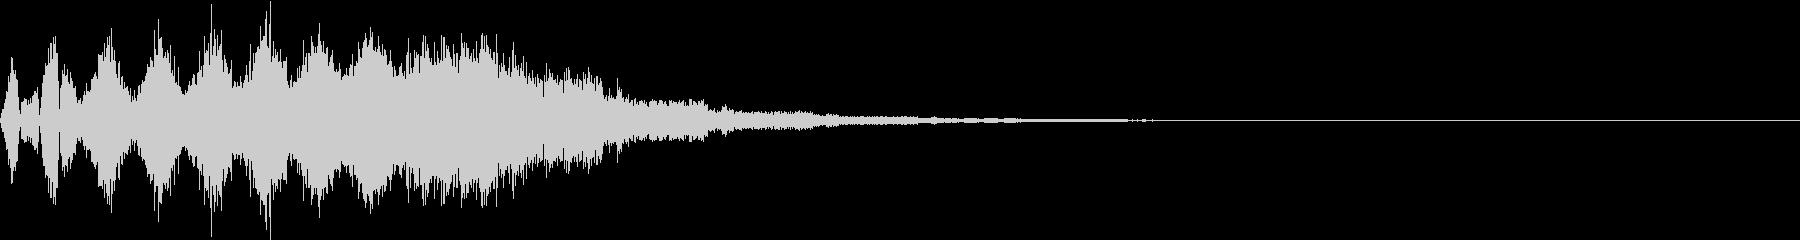 TVFX 目立たせ・アイキャッチ 18の未再生の波形